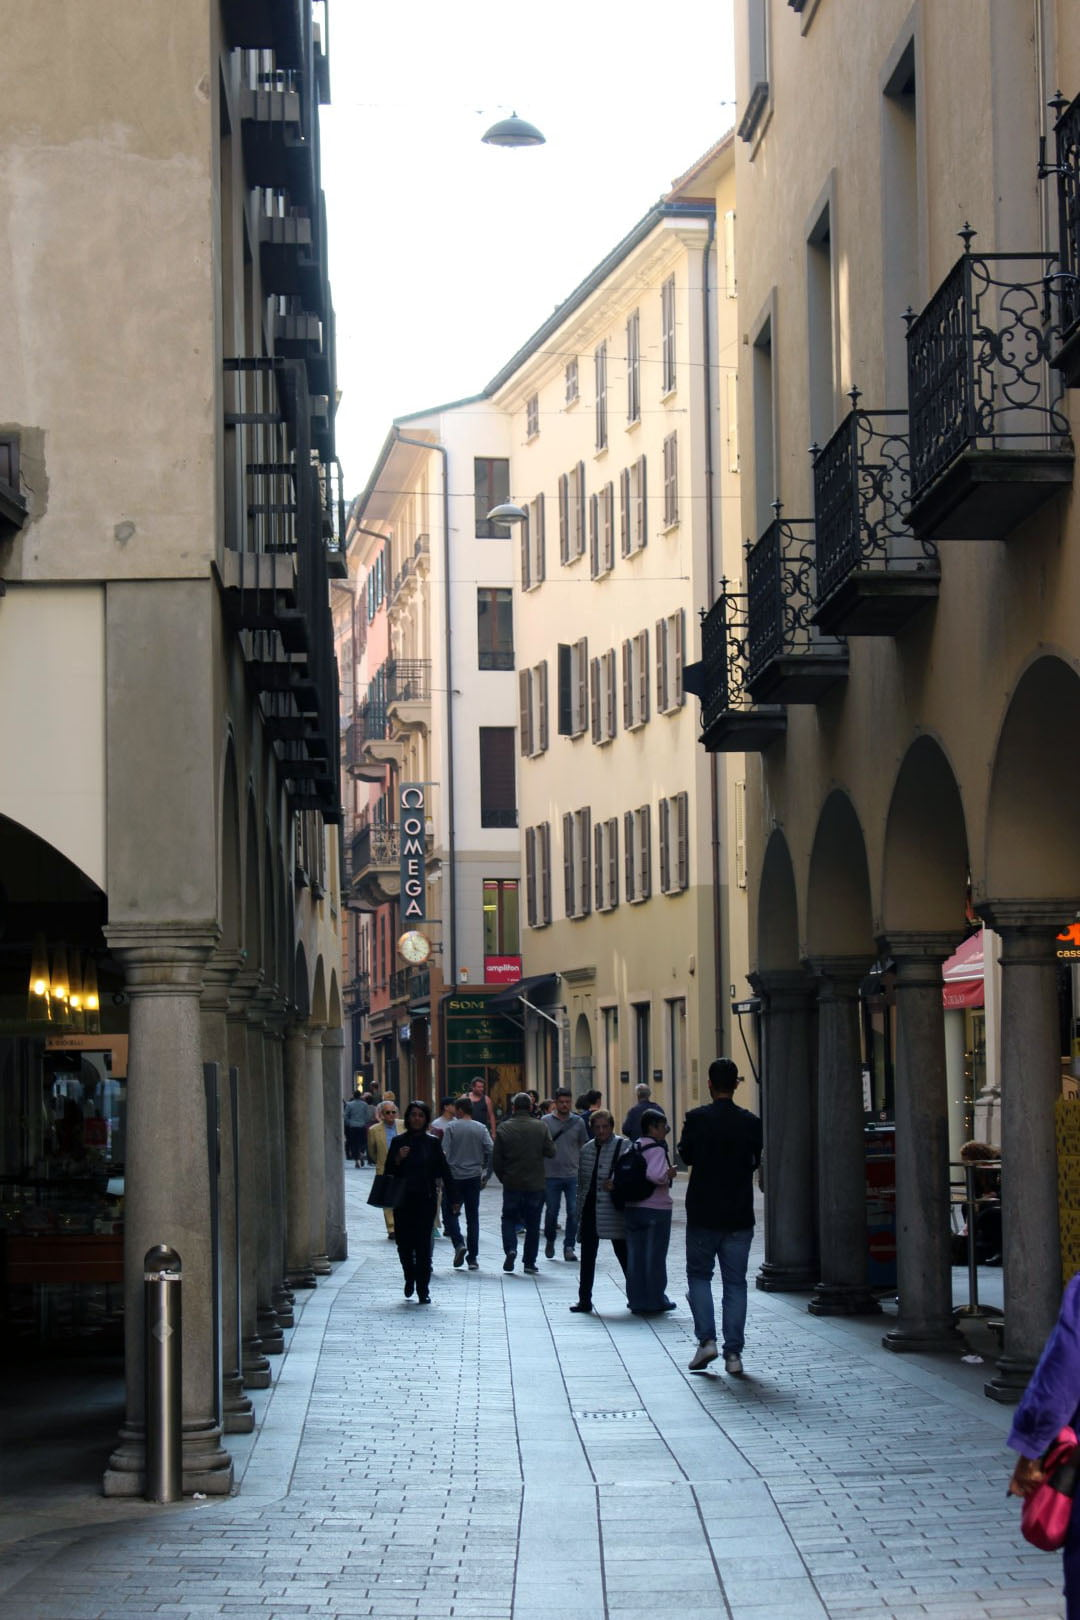 Svajcarska_Lugano_Izlet_Jezero_Metropole_First_minute_akcija